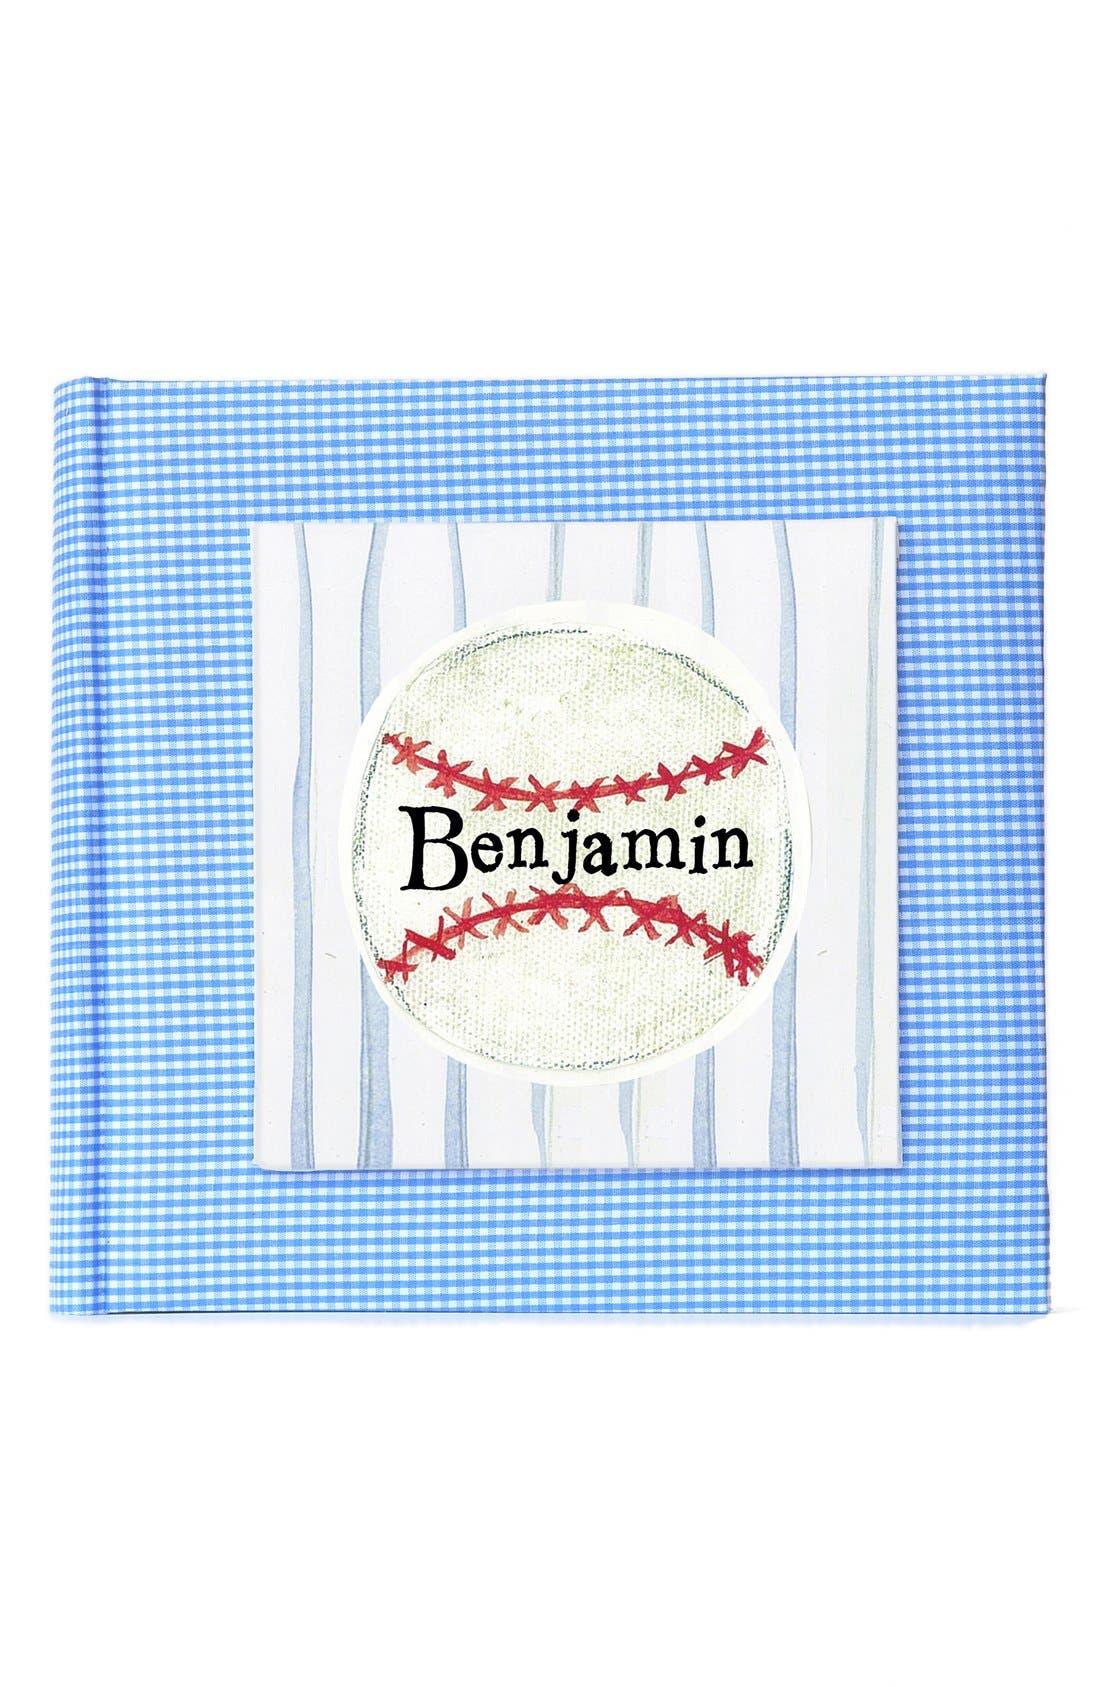 'Baseball' Personalized Photo Album,                             Main thumbnail 1, color,                             400